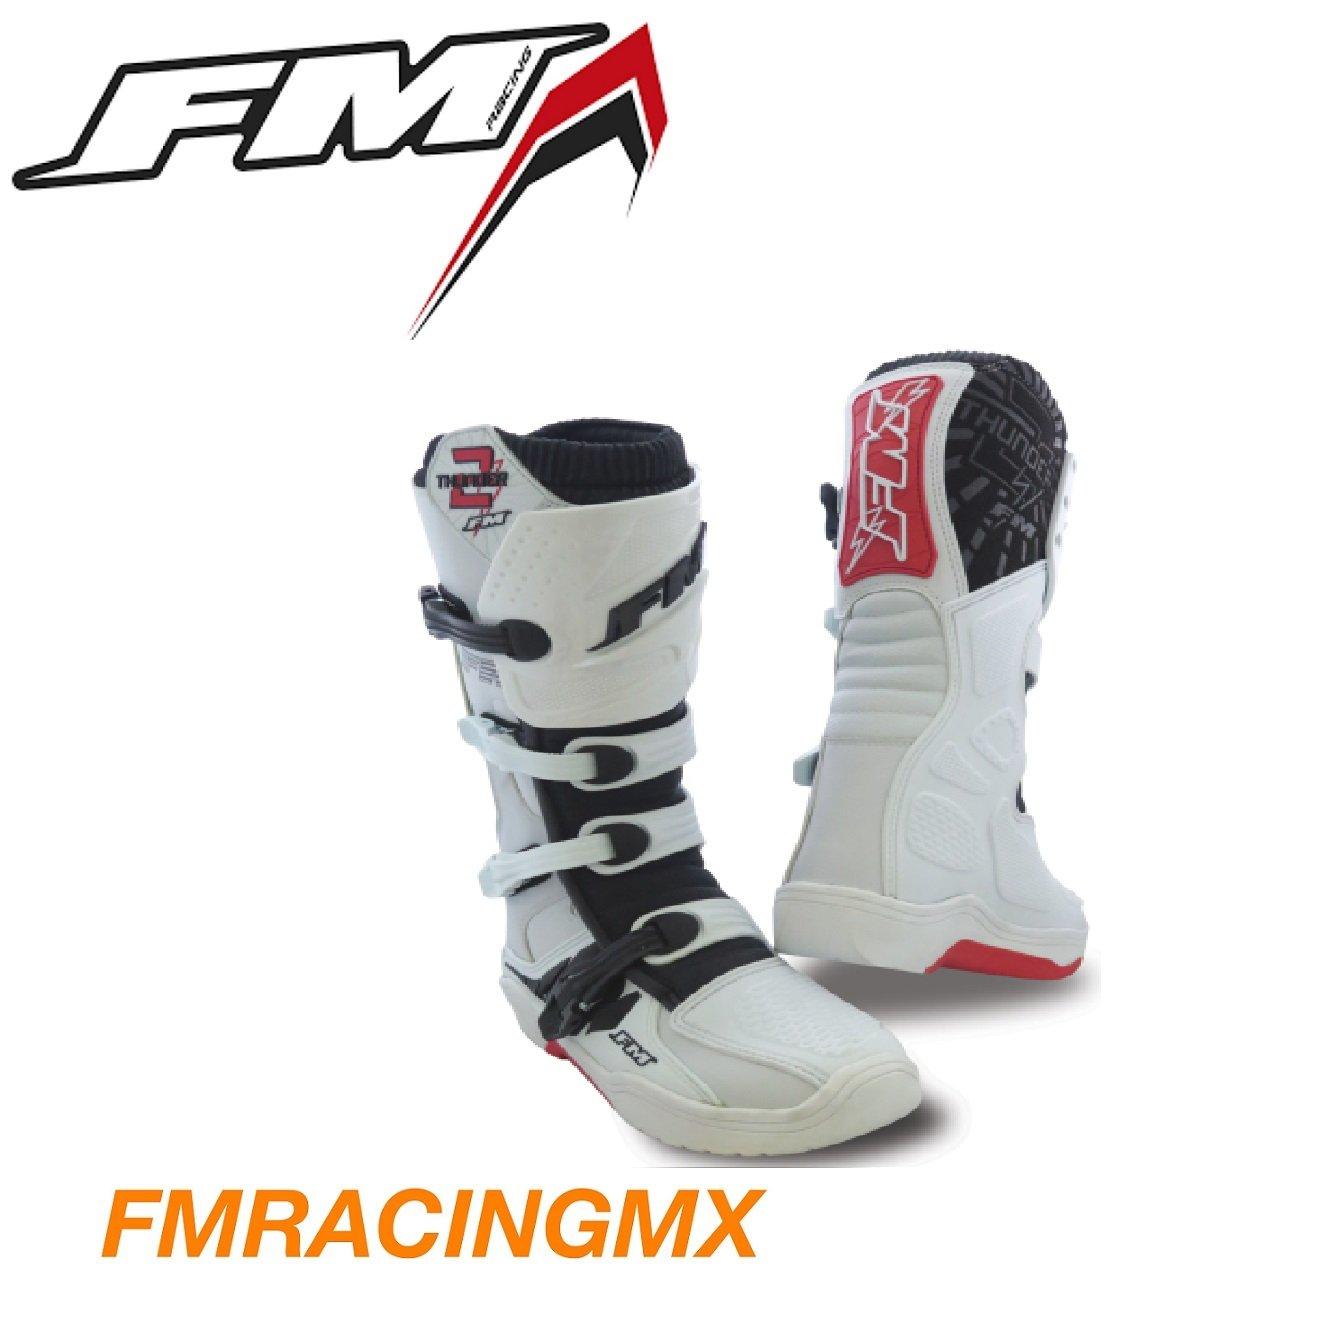 /Talla 45 Botas bota Thunder II blancos MX Cross Enduro Quad ATV FM Racing/